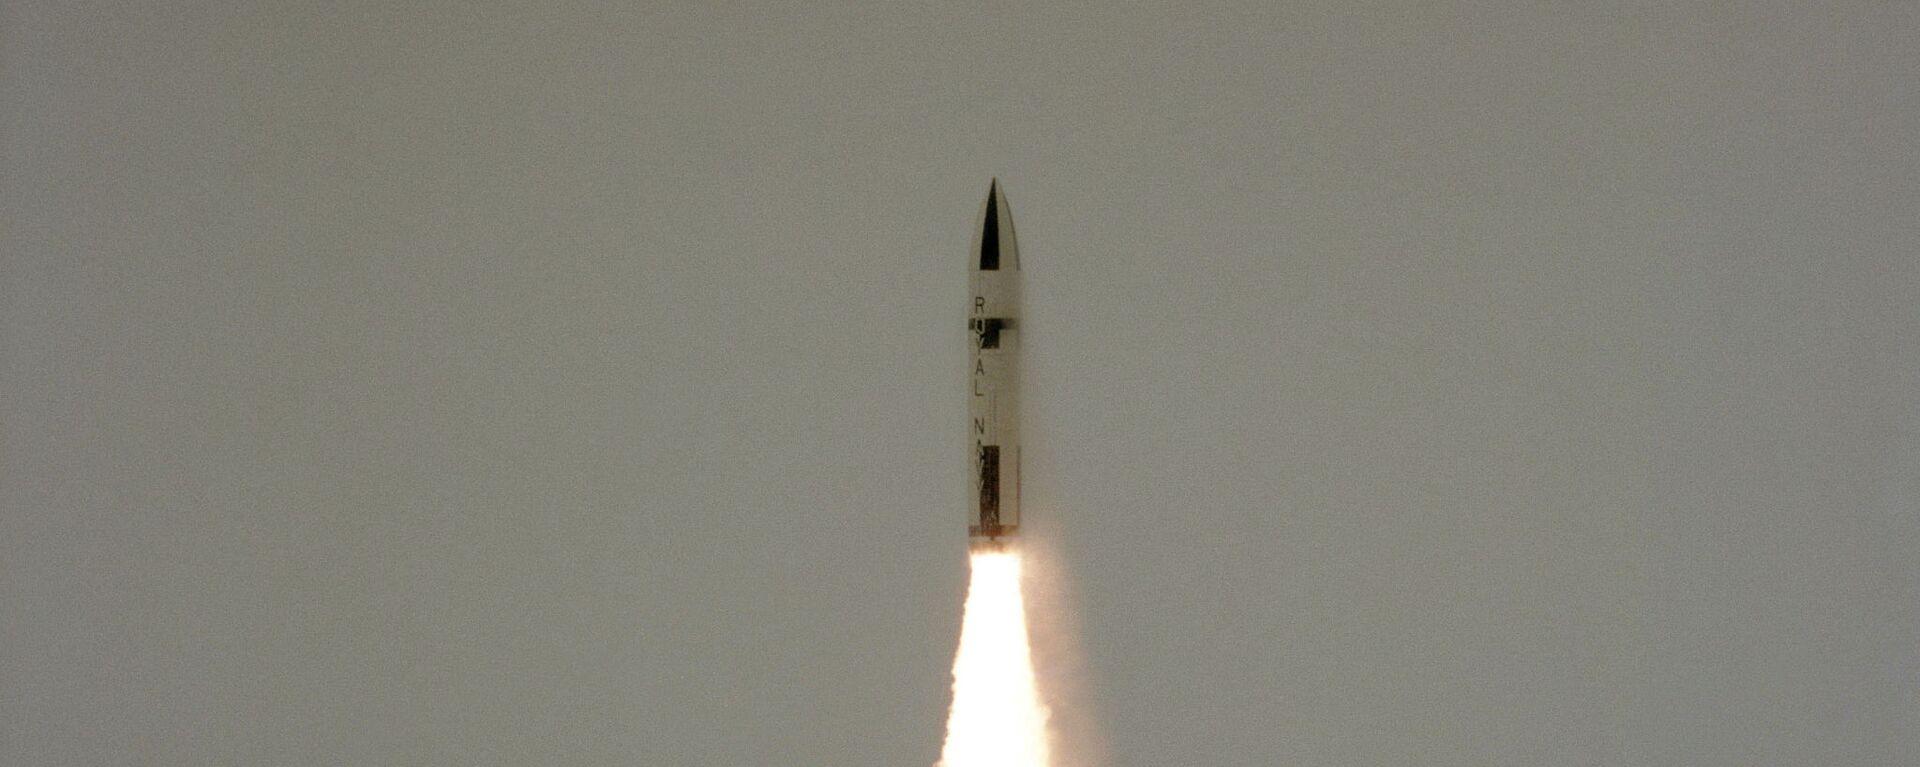 Polaris missile launch from HMS Revenge - Sputnik International, 1920, 18.09.2021